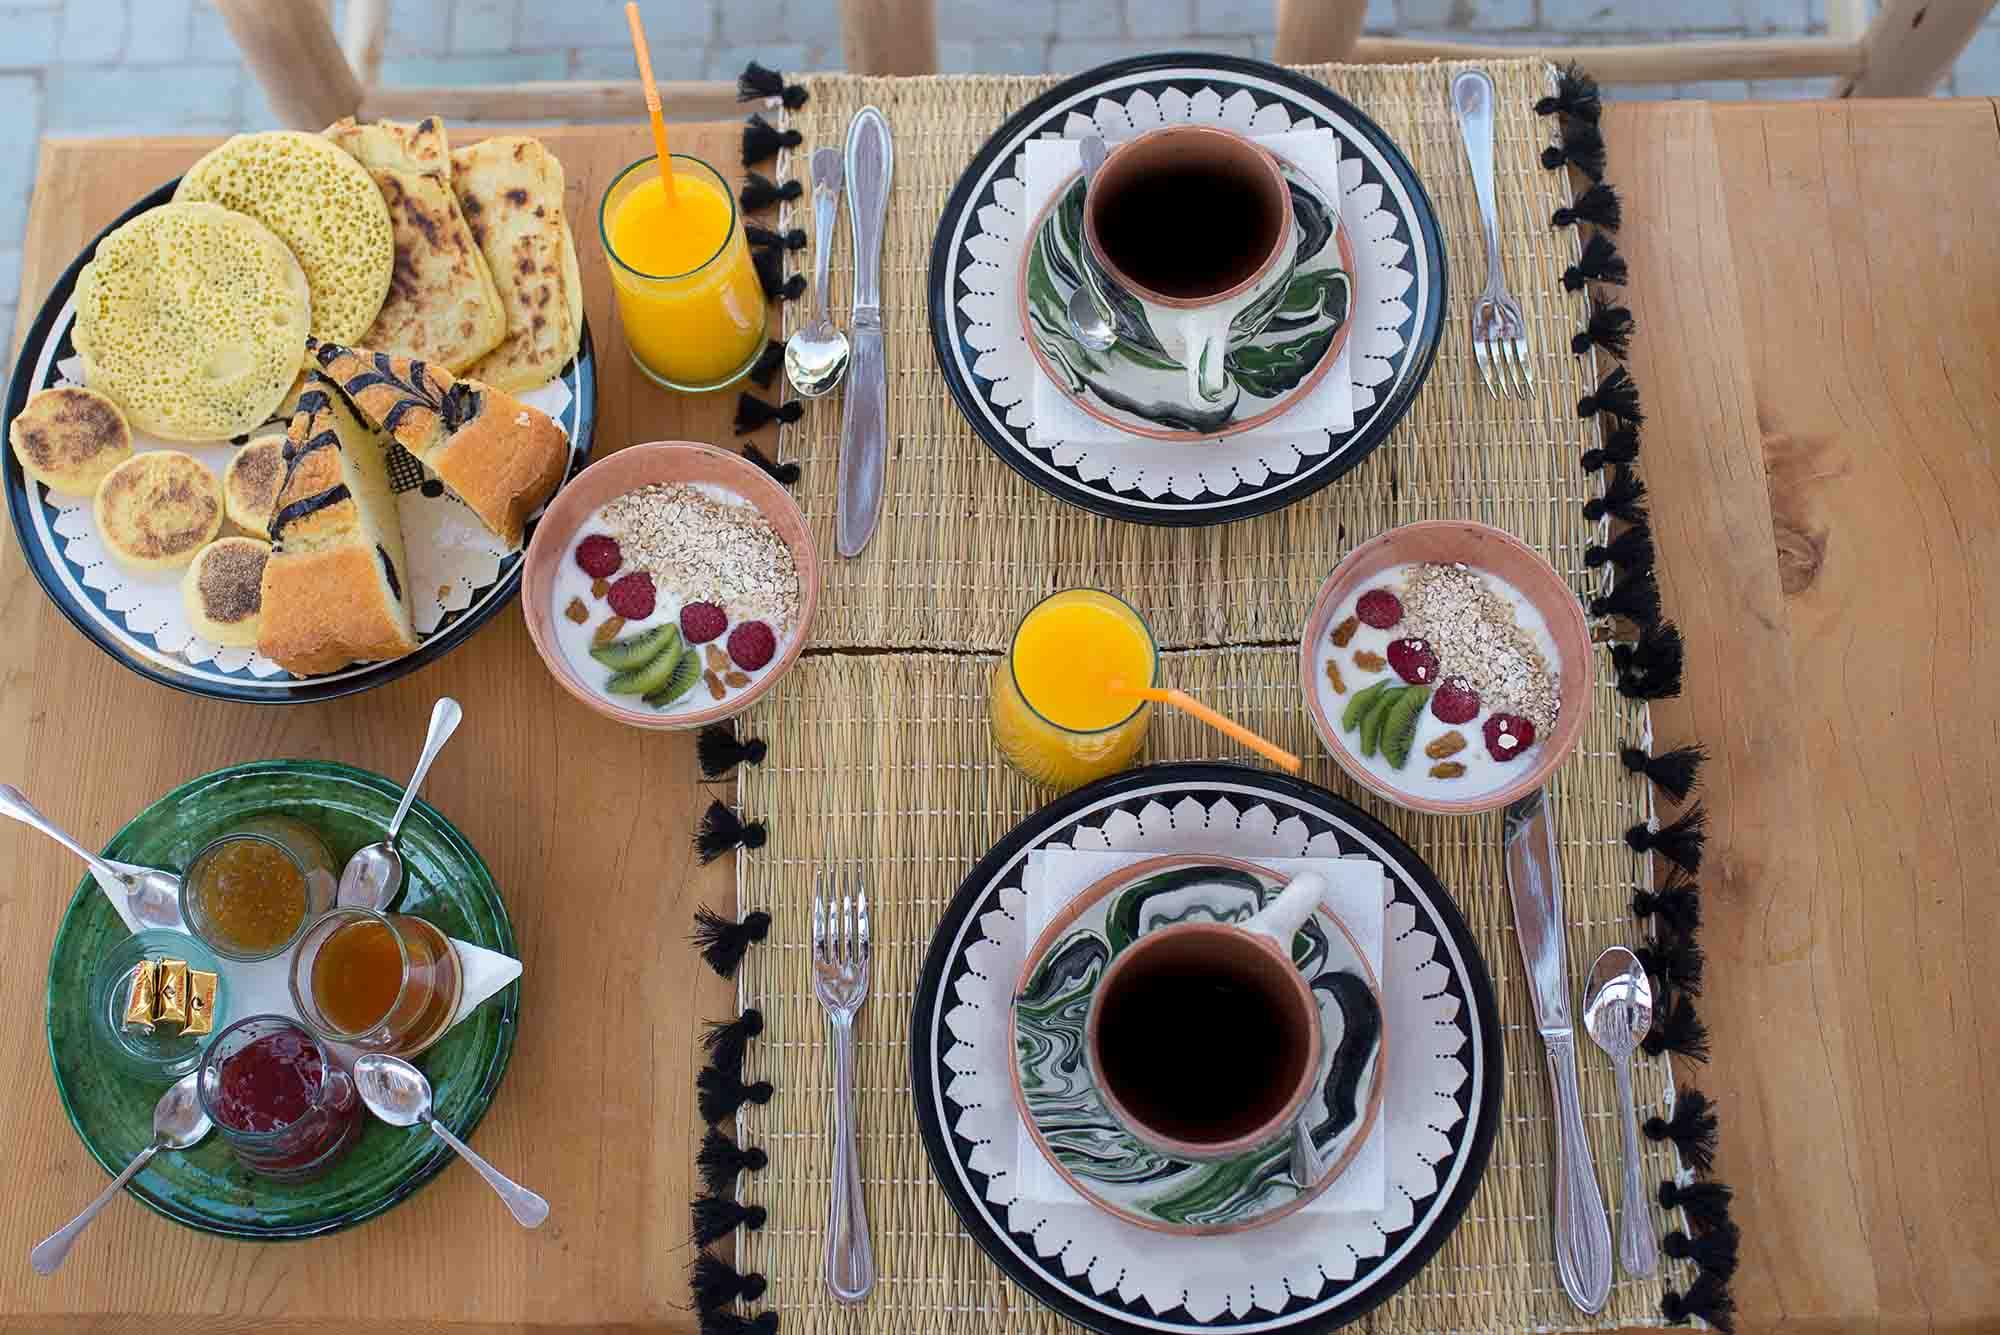 KSAR KASBAH & SPA MARRAKECH cuisine petit déjeuner